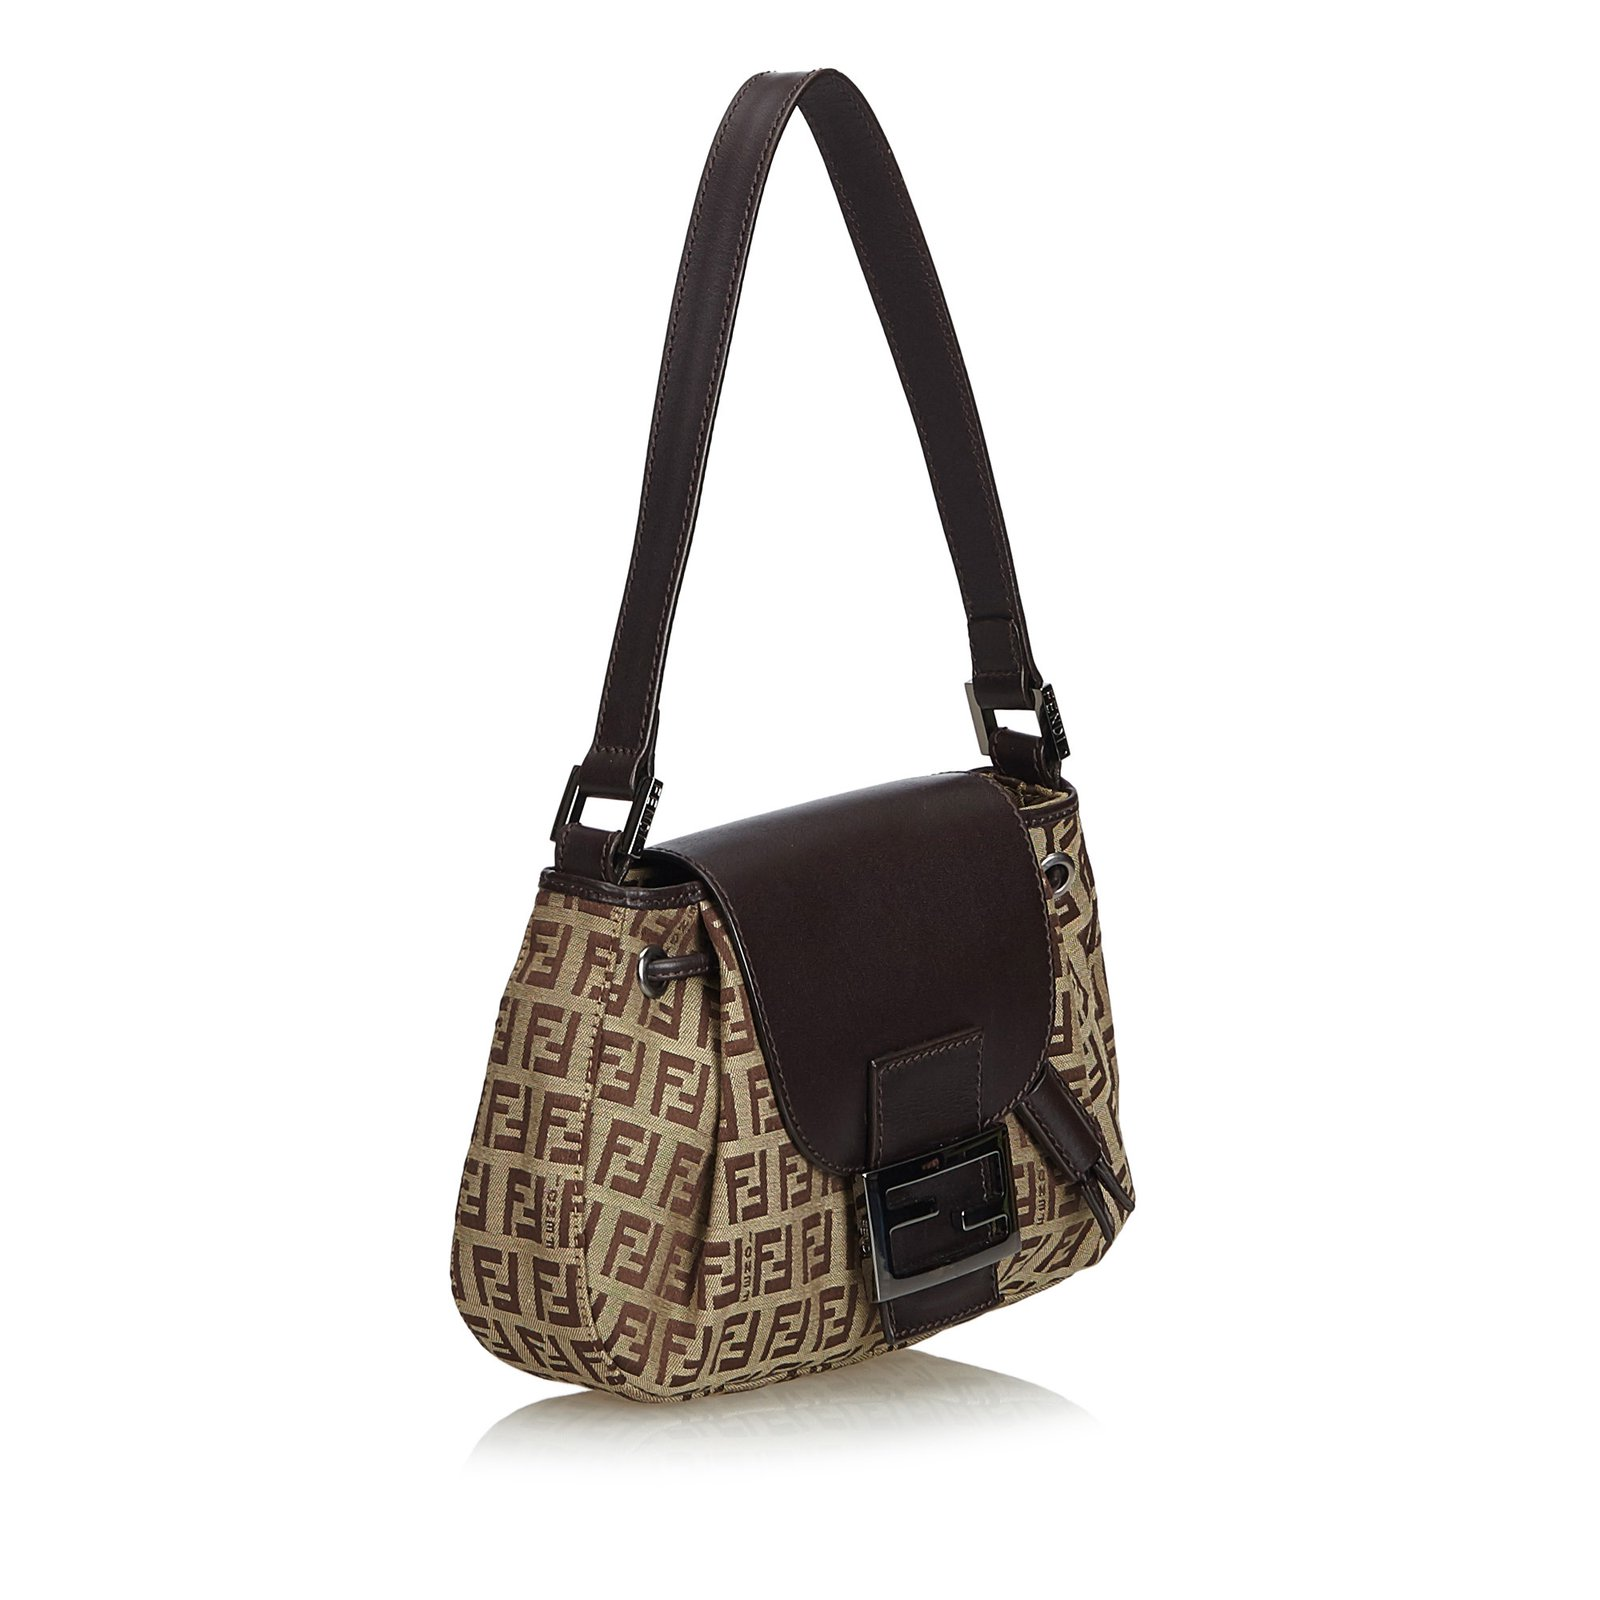 b35ea463de00 Fendi Zucchino Jacquard Shoulder Bag Handbags Leather